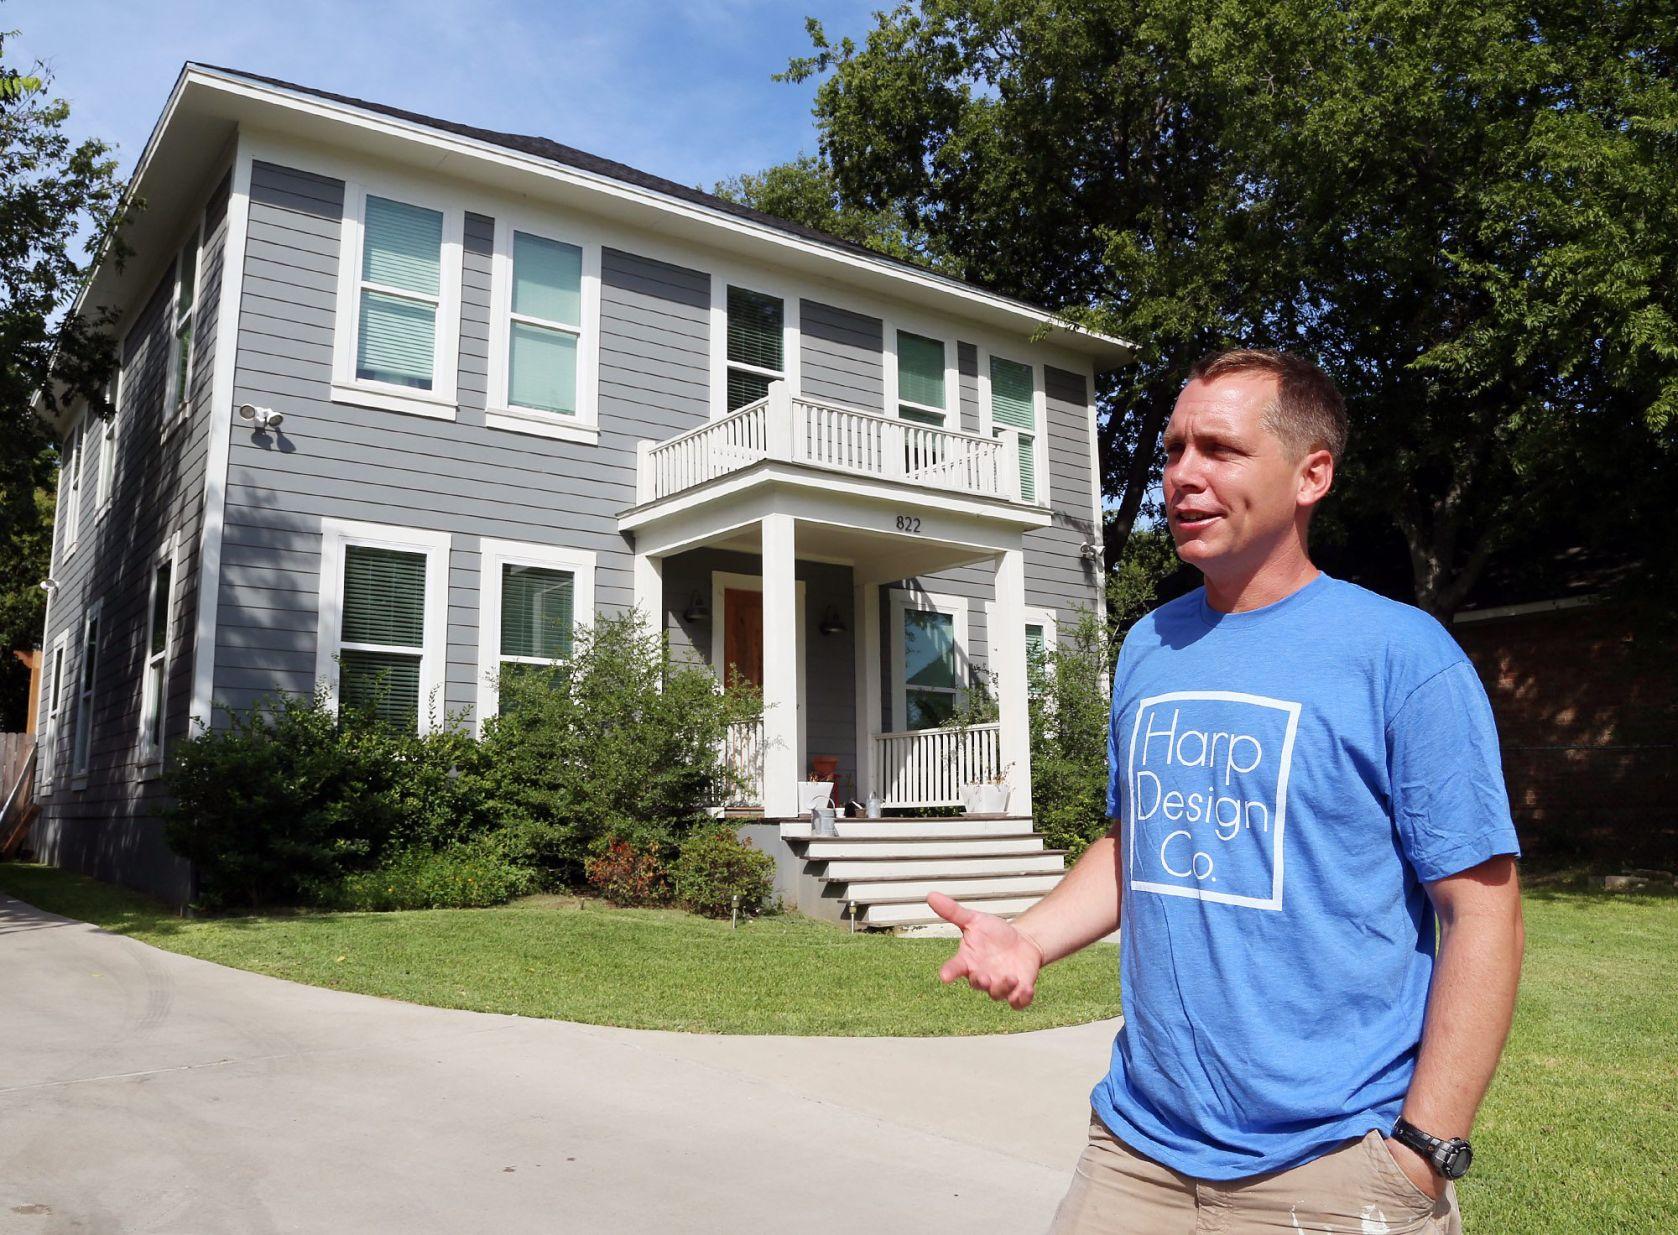 Superb Fixer Upper Airbnb Fixer Houses Becoming Vacation Rentals Around Waco Fixer Upper Houses Waco Tx Fixer Upper Houses Houston curbed Fixer Upper Houses